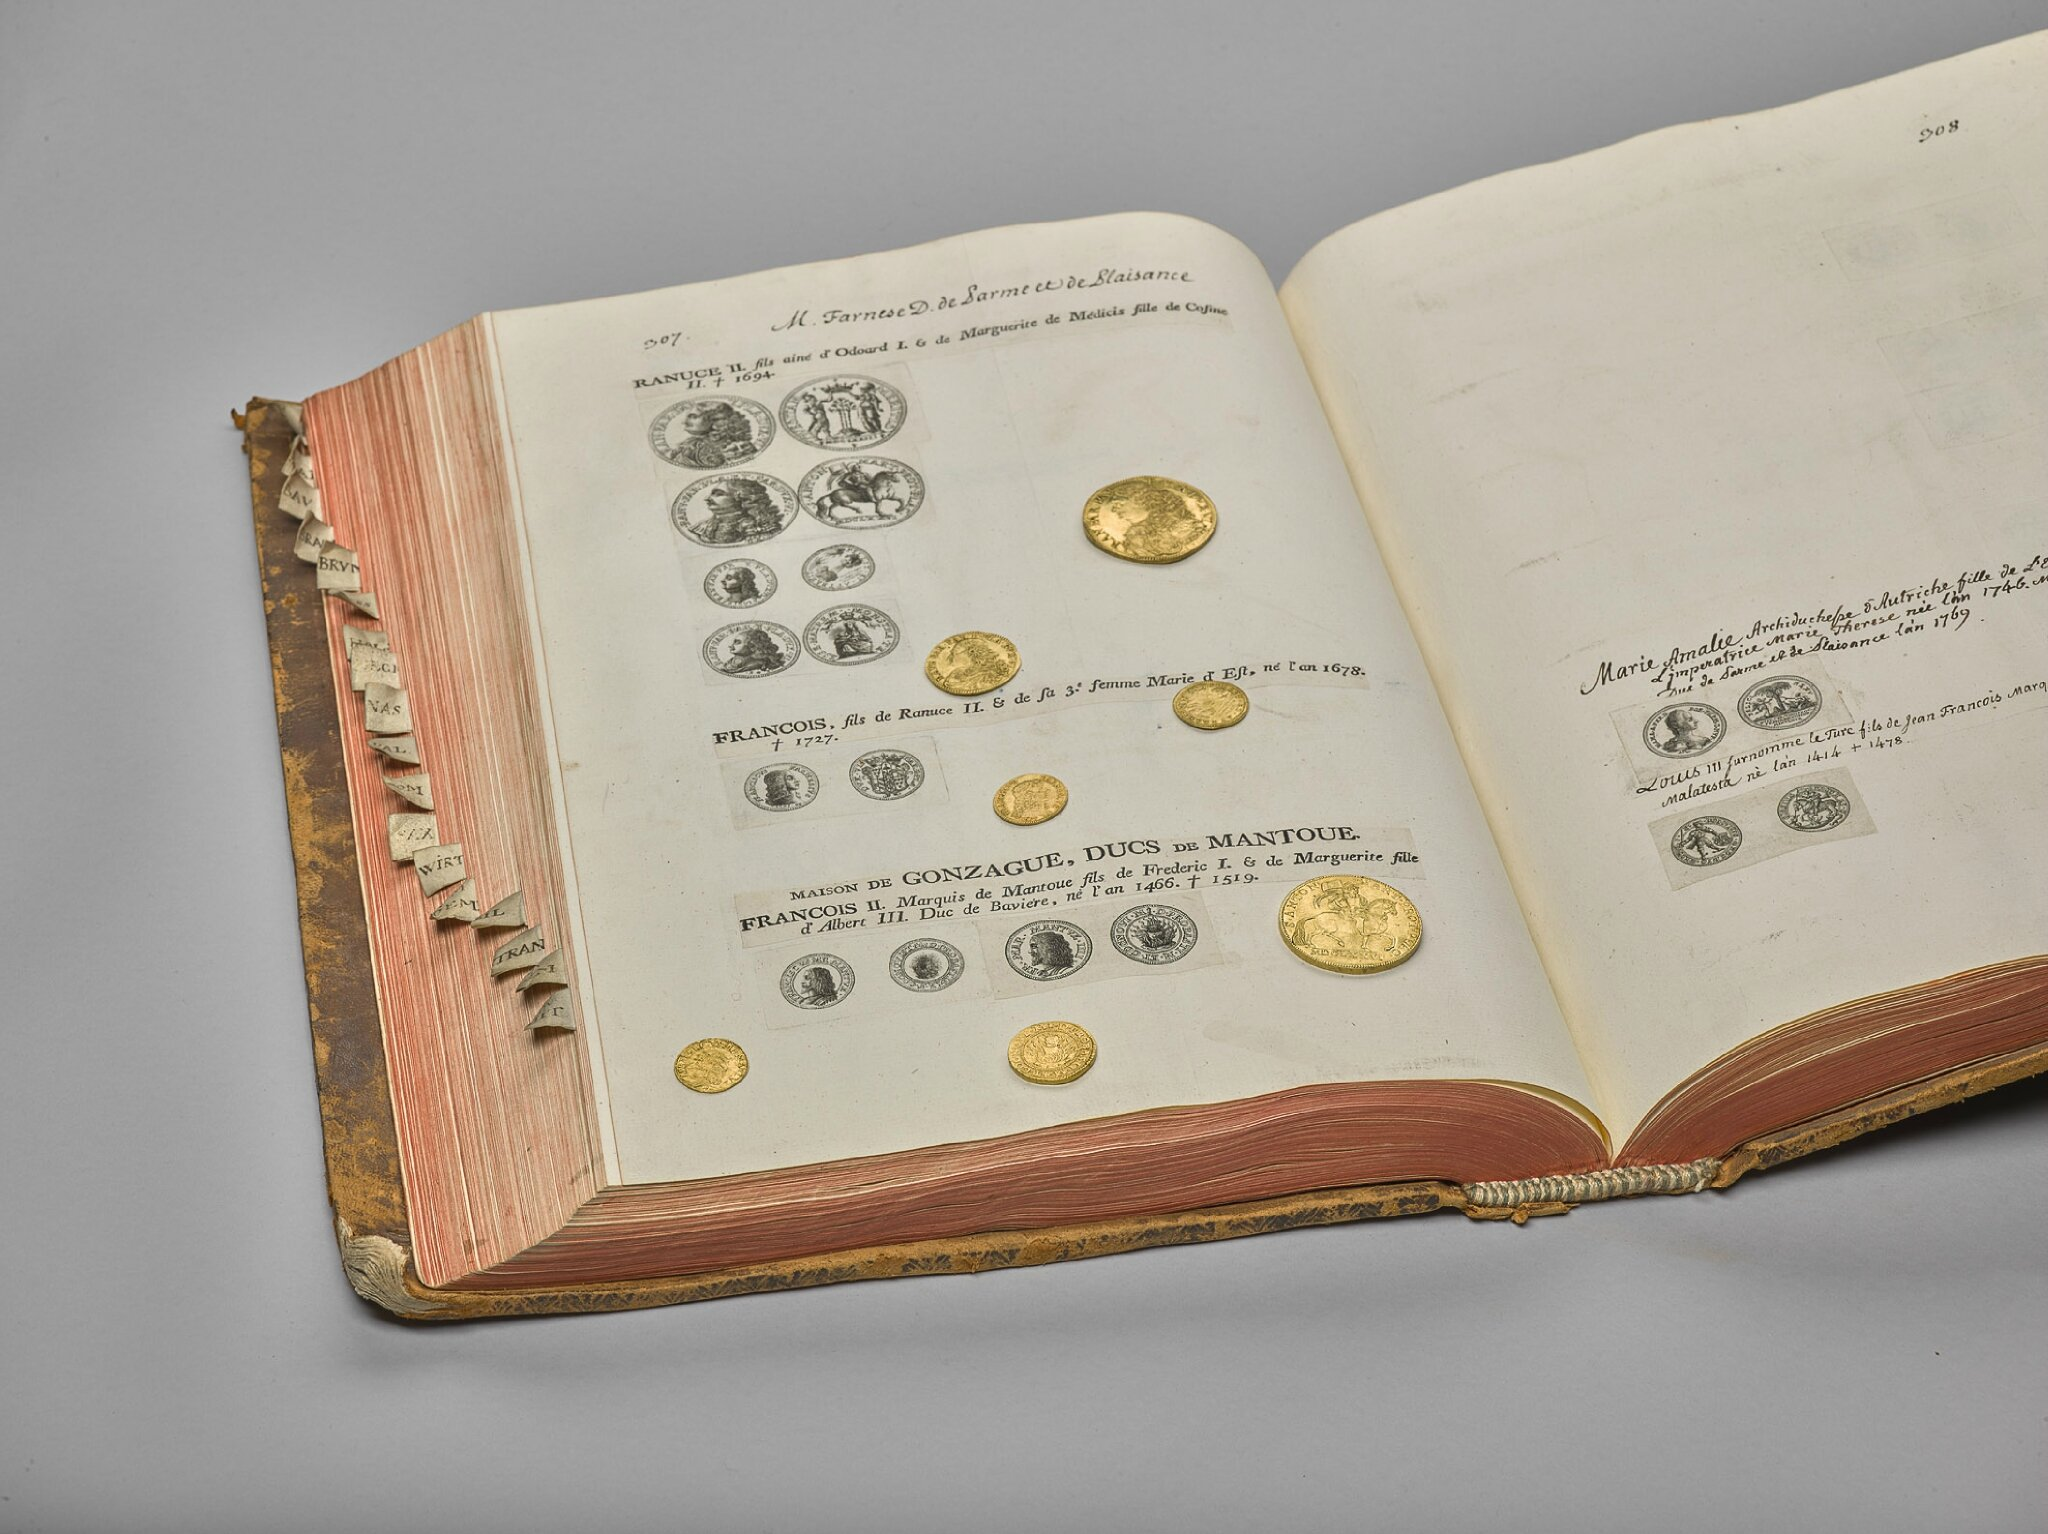 Comment Faire Des Badges Maison kunsthistorisches museum exhibits works from the emperor's